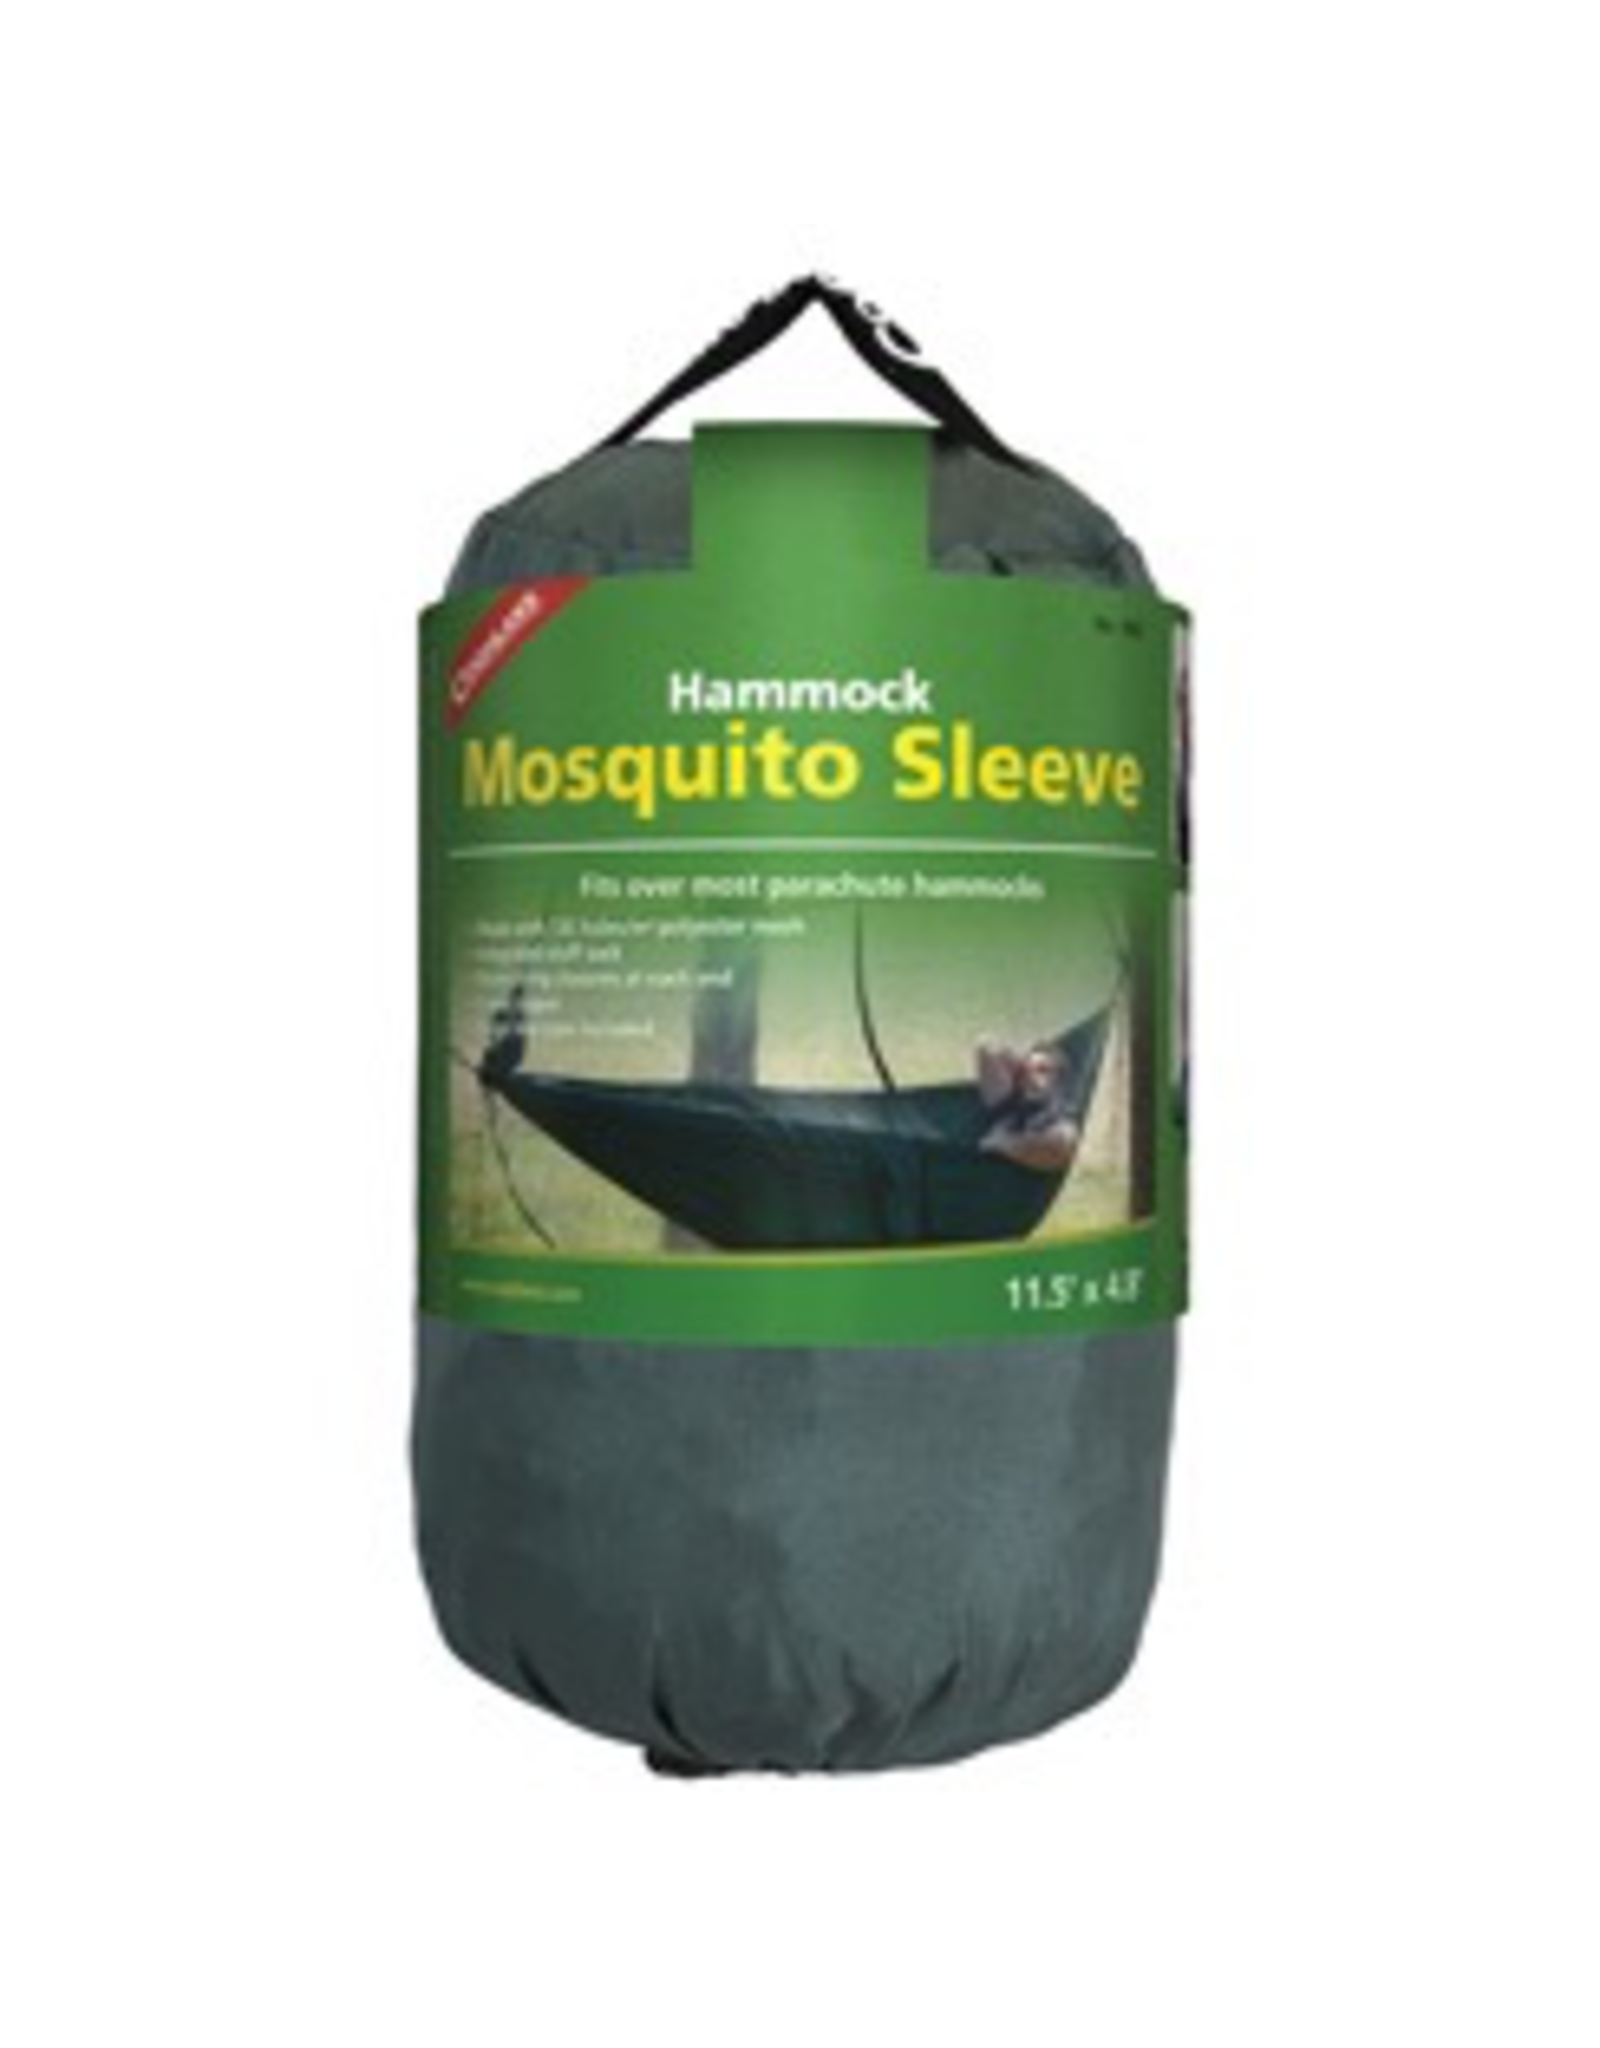 Coghlan's Coghlan's Mosquito Sleeve